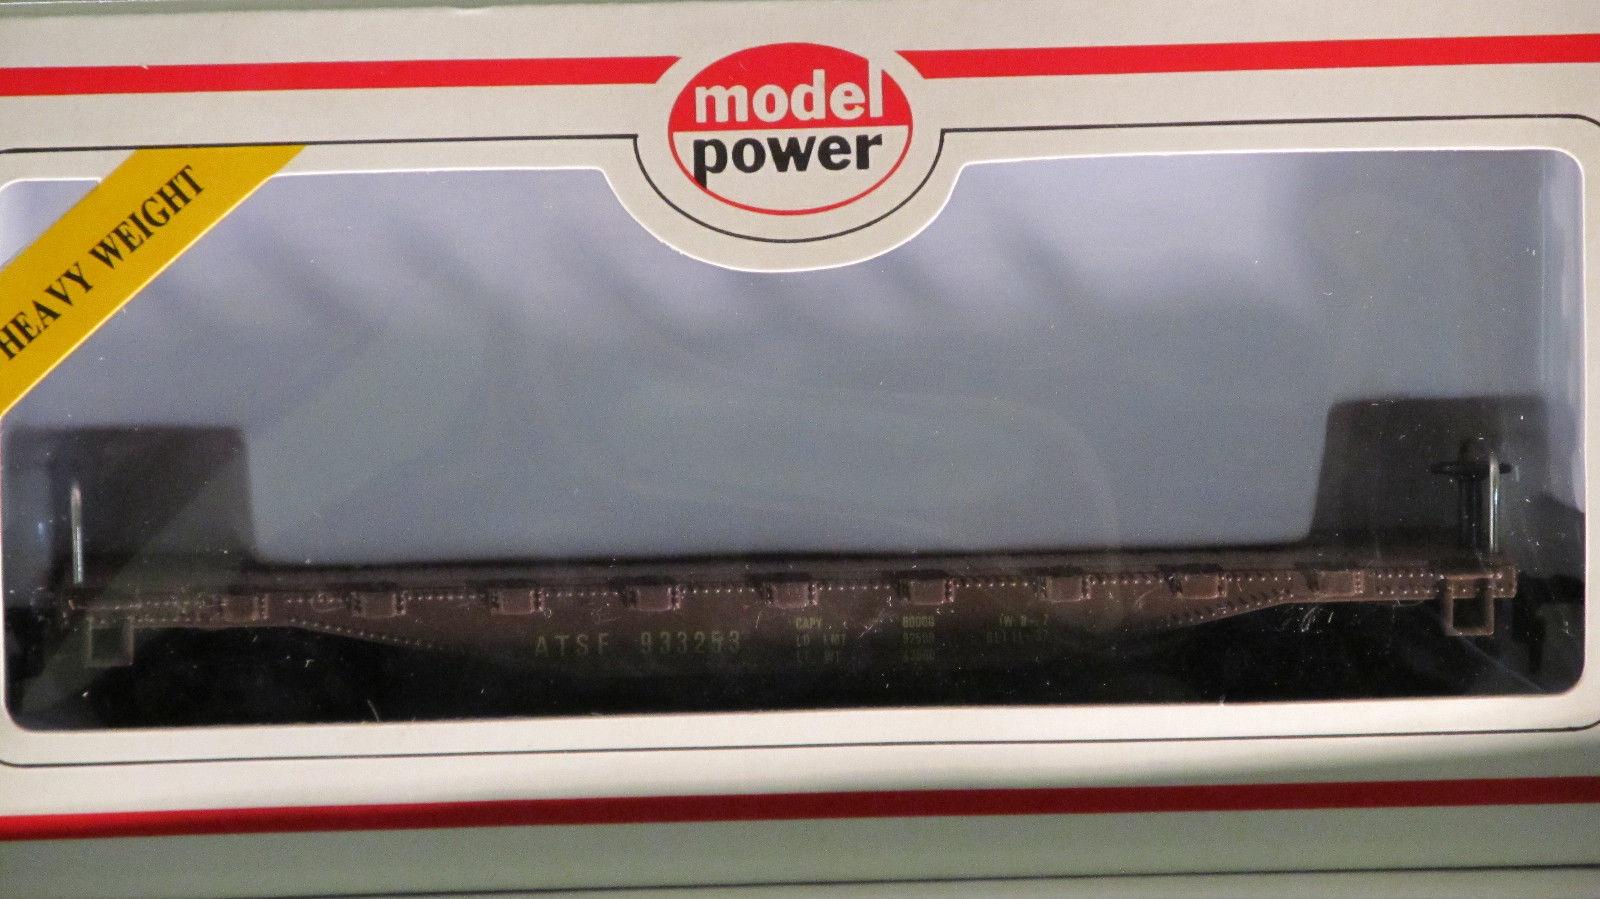 De Modeler: Tips Ho scale model train buildings and vehicles